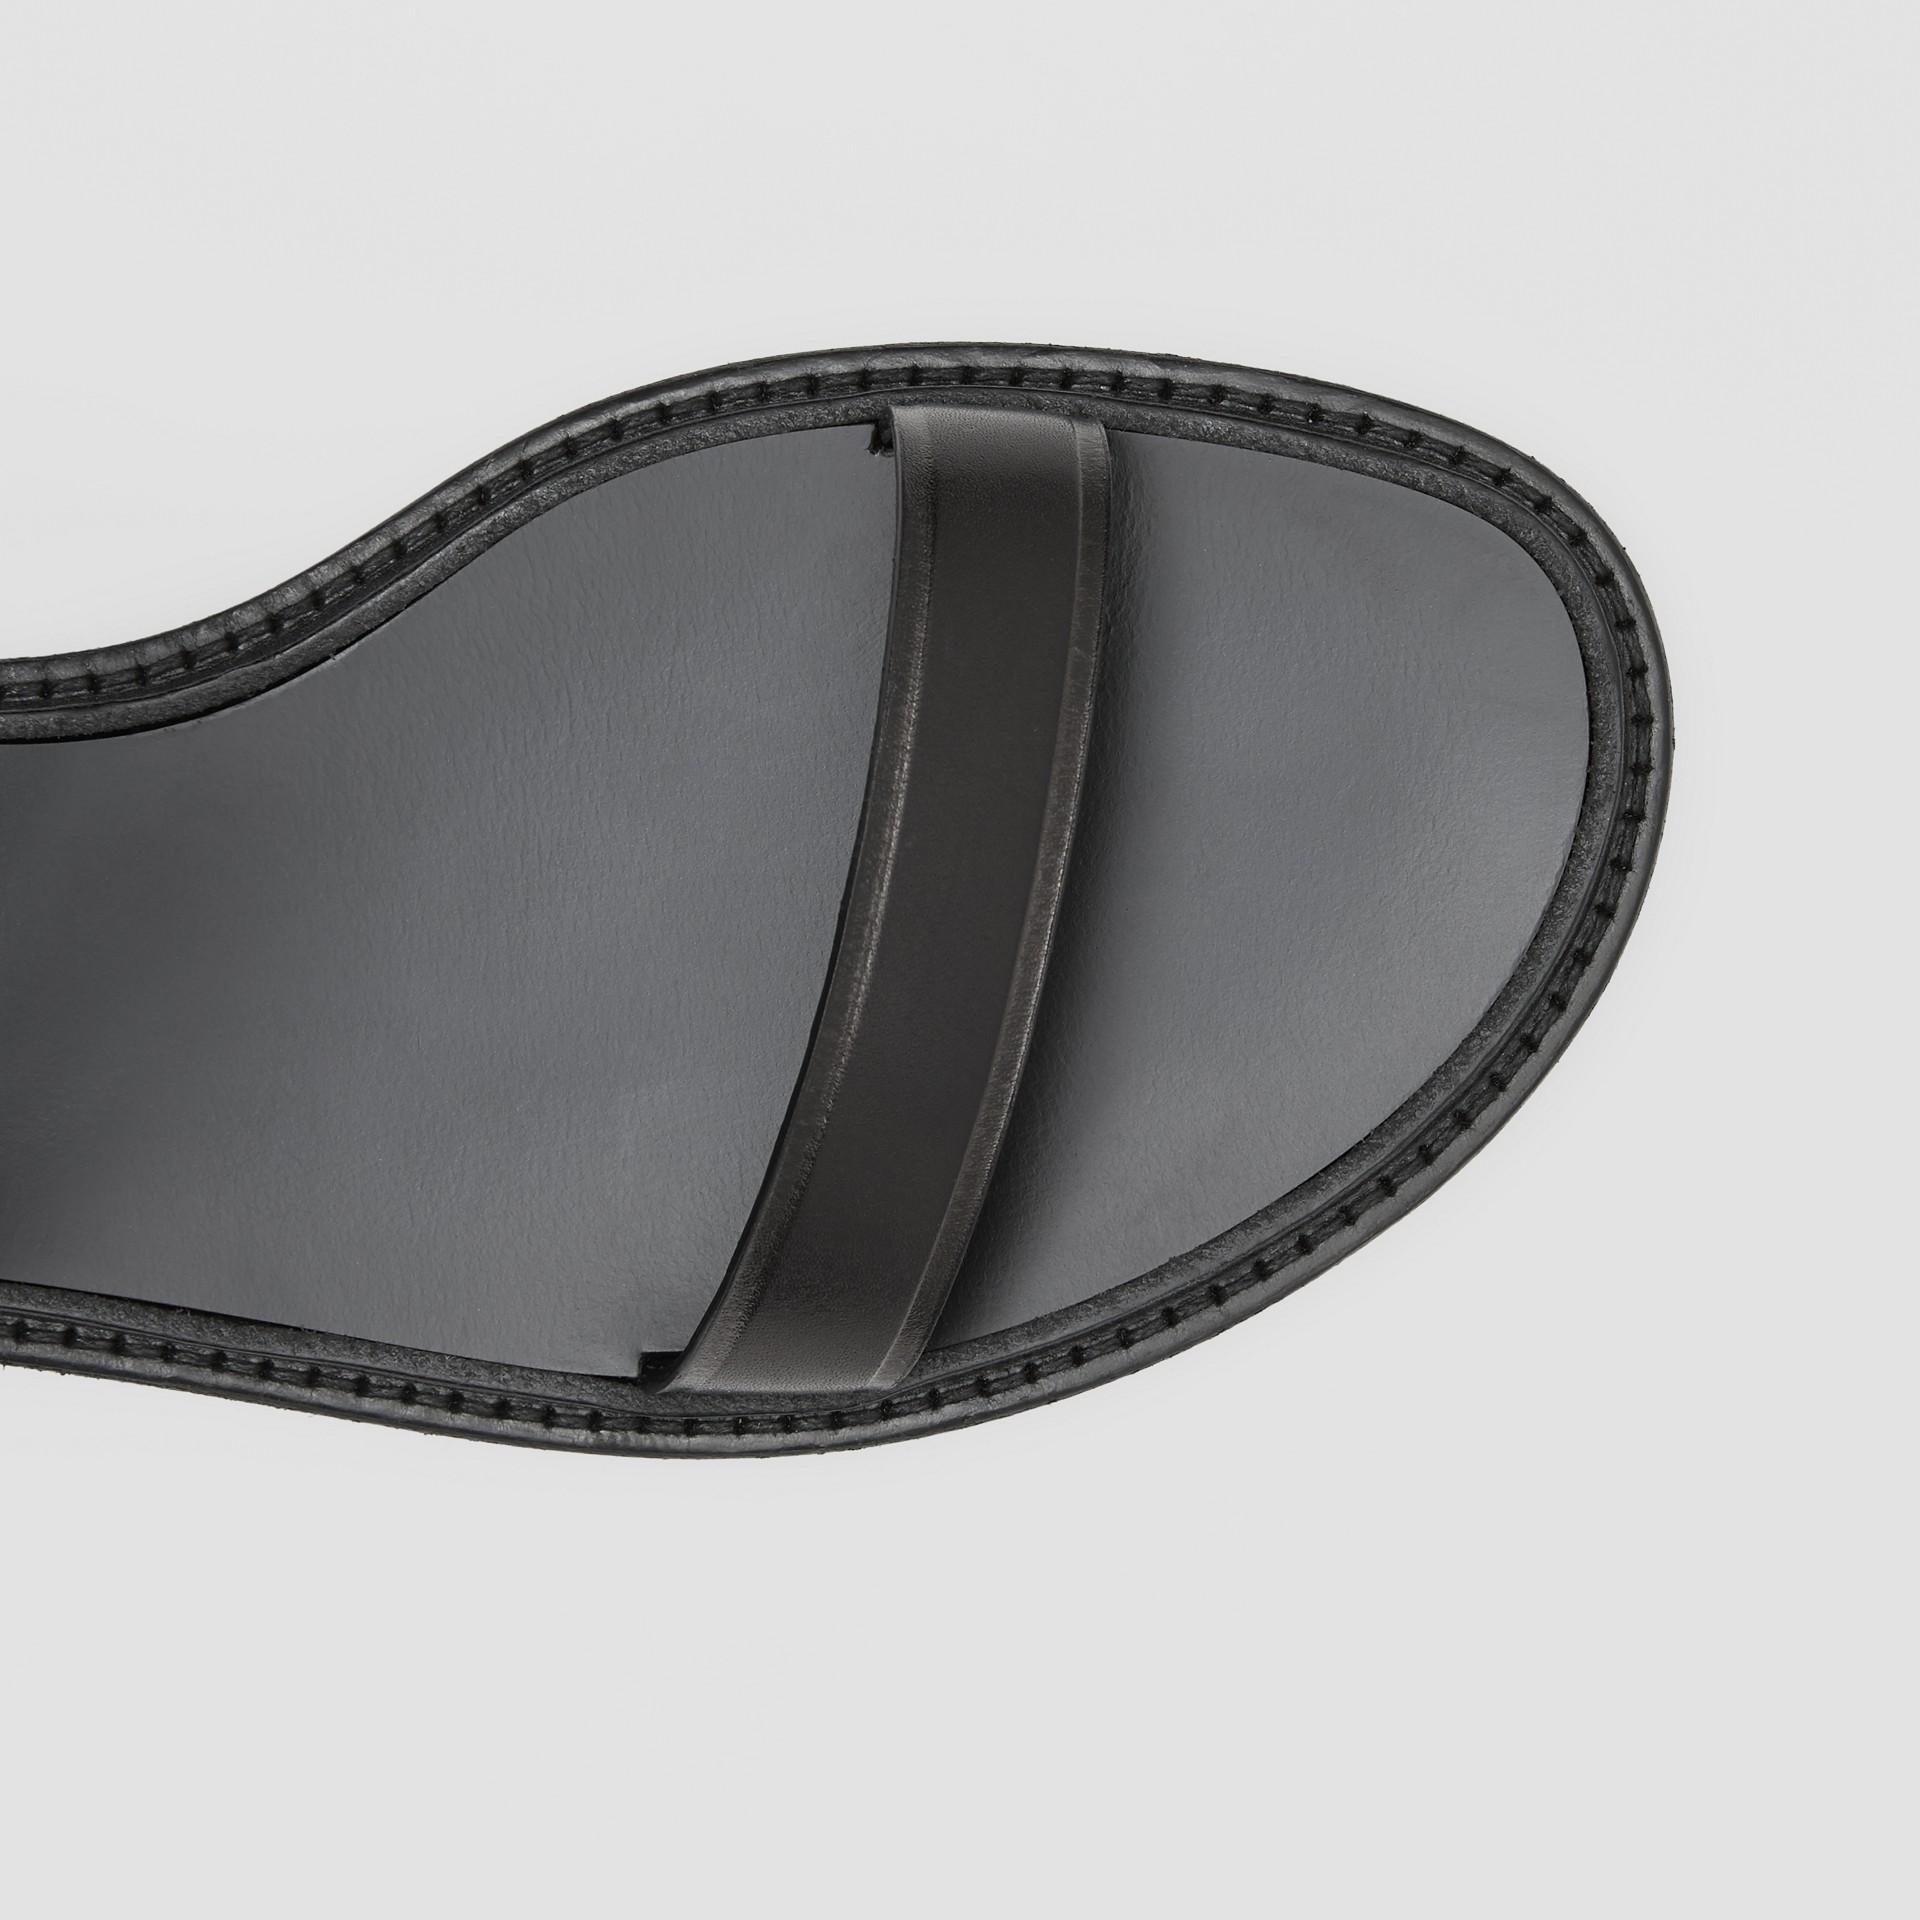 Monogram Motif Leather Sandals in Black - Women | Burberry United Kingdom - gallery image 1